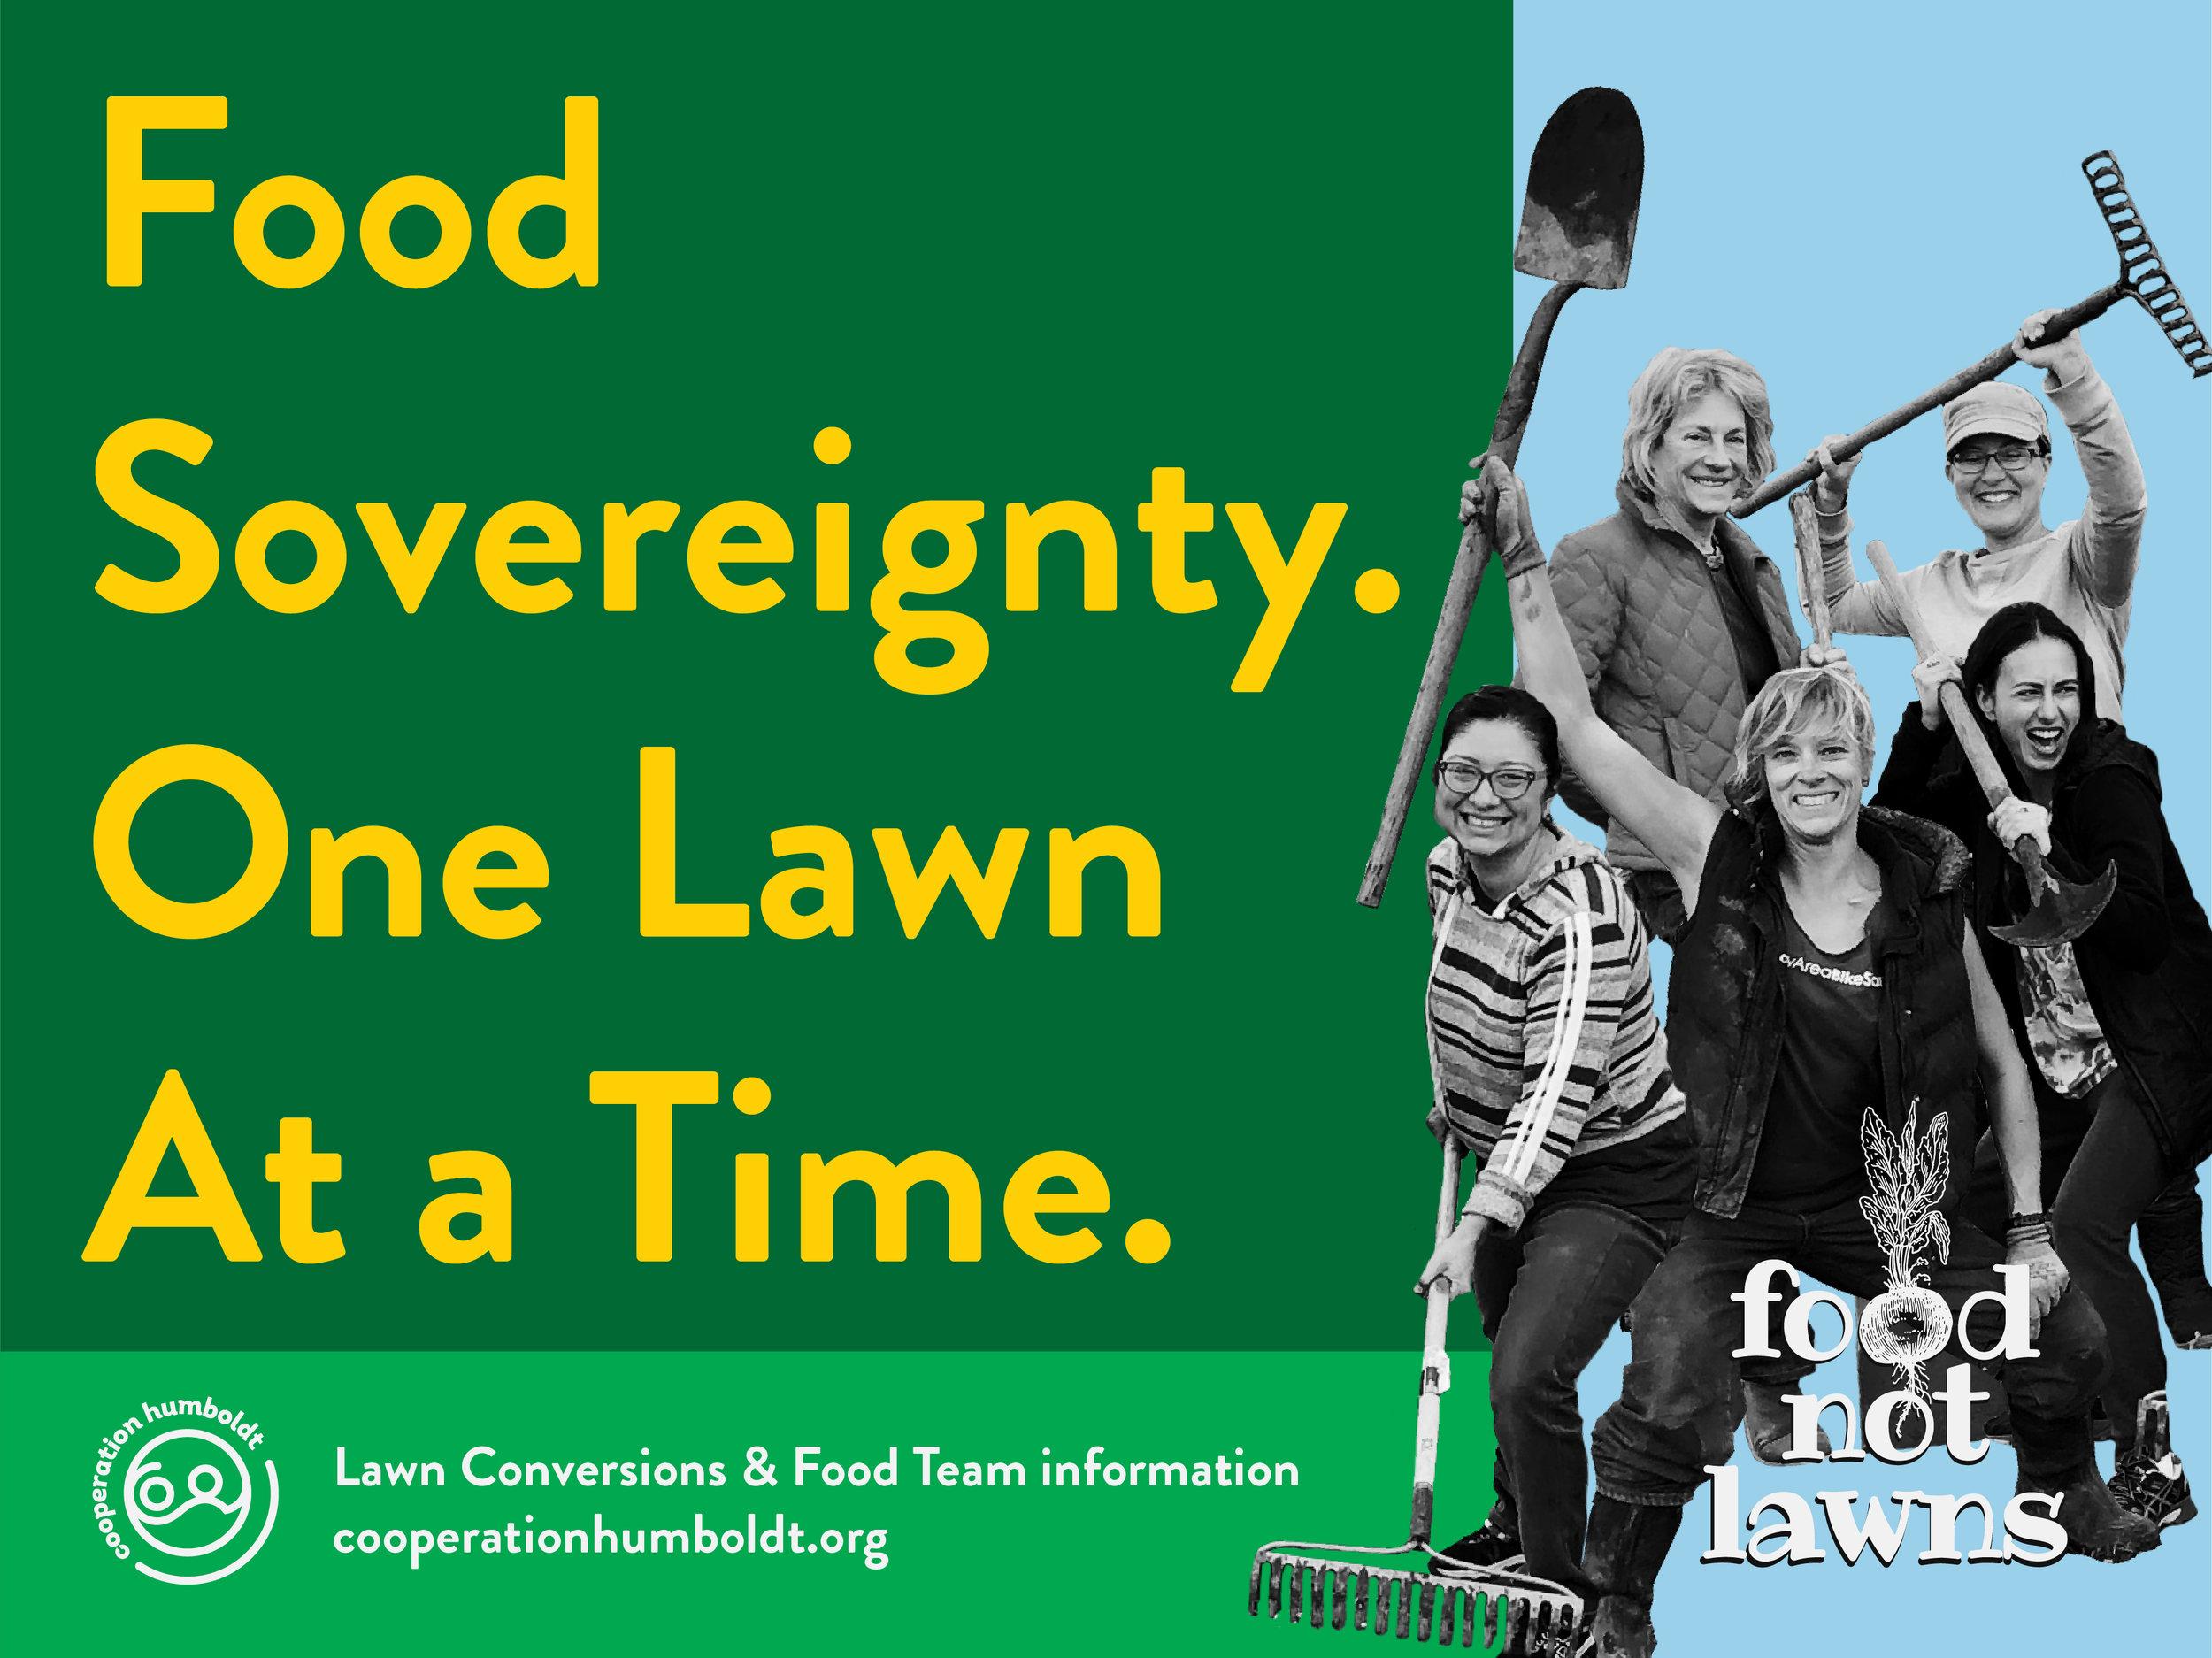 Lawn conversion sign-05.jpg